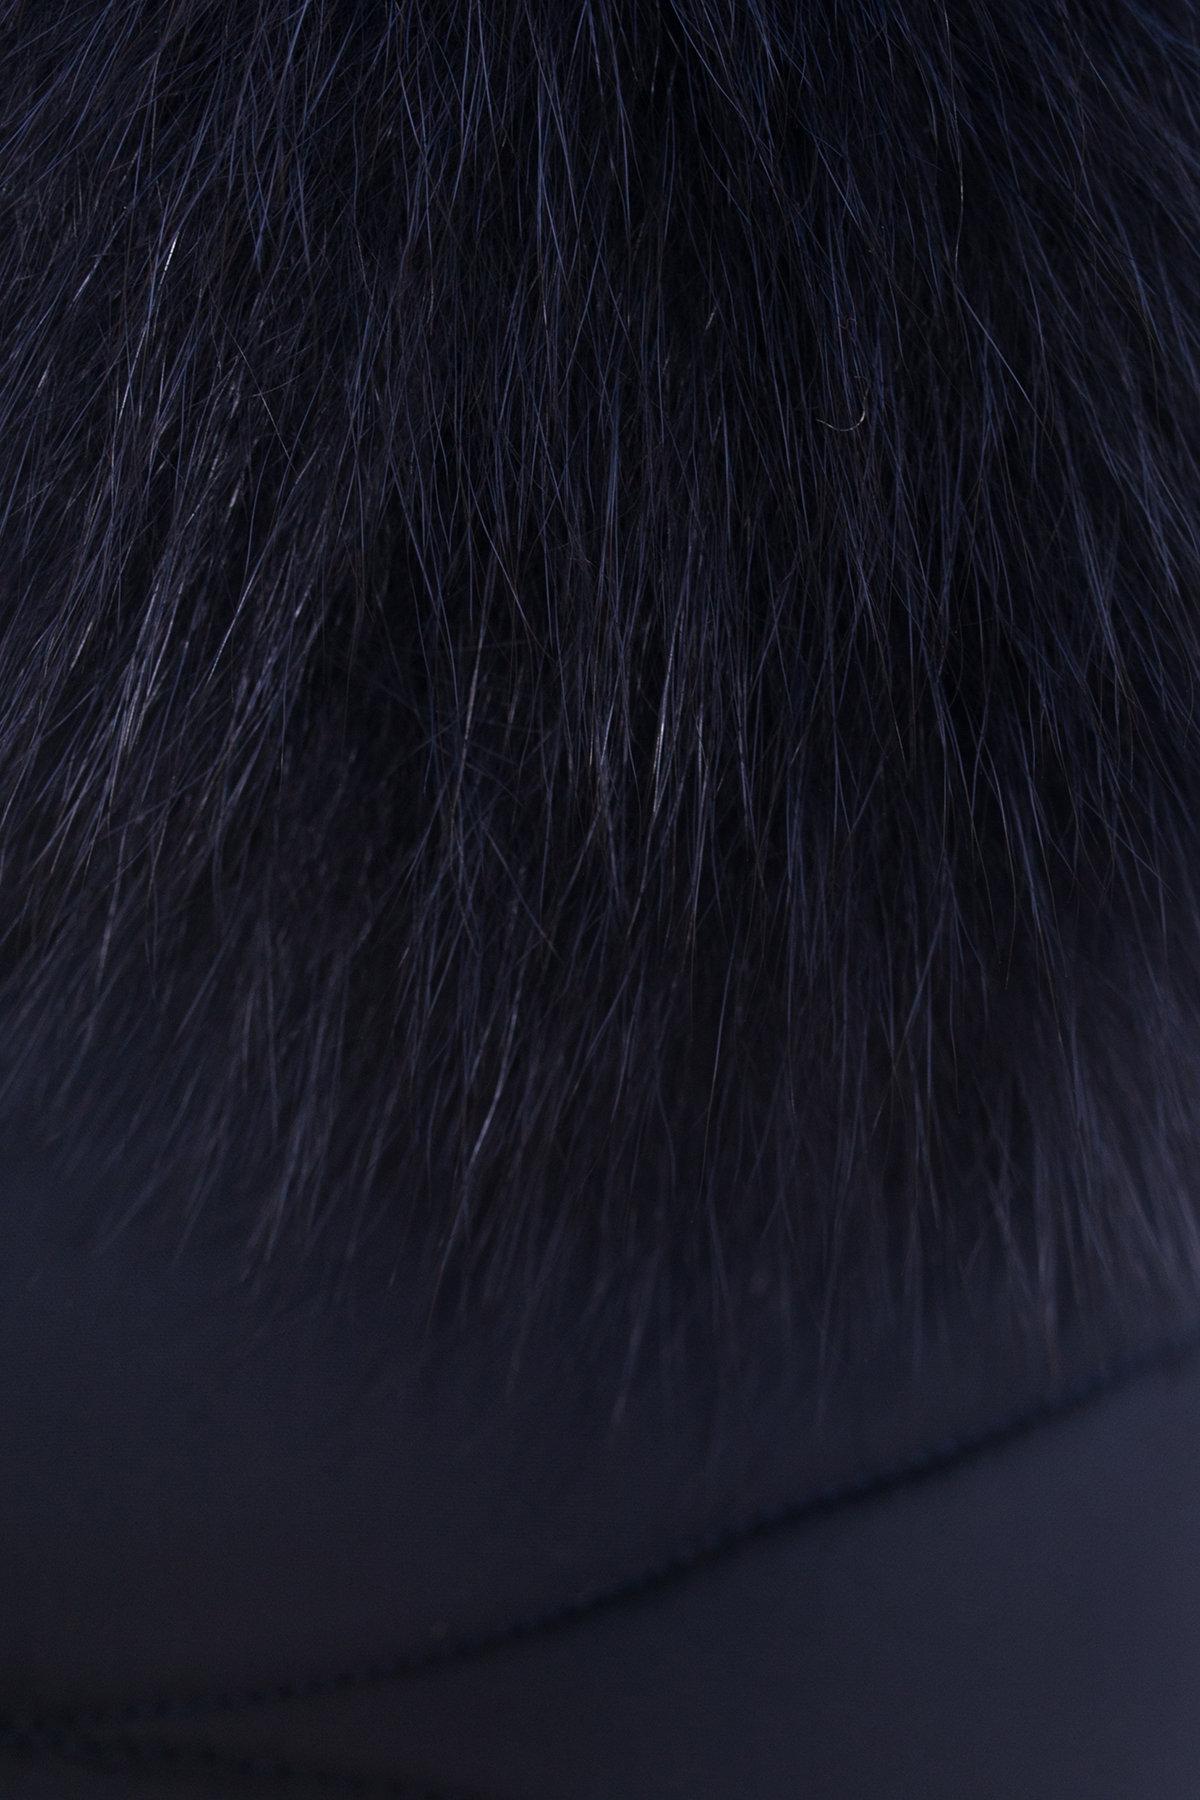 Пуховик с капюшоном Ингрид 3267 АРТ. 16940 Цвет: Темно-синий - фото 4, интернет магазин tm-modus.ru